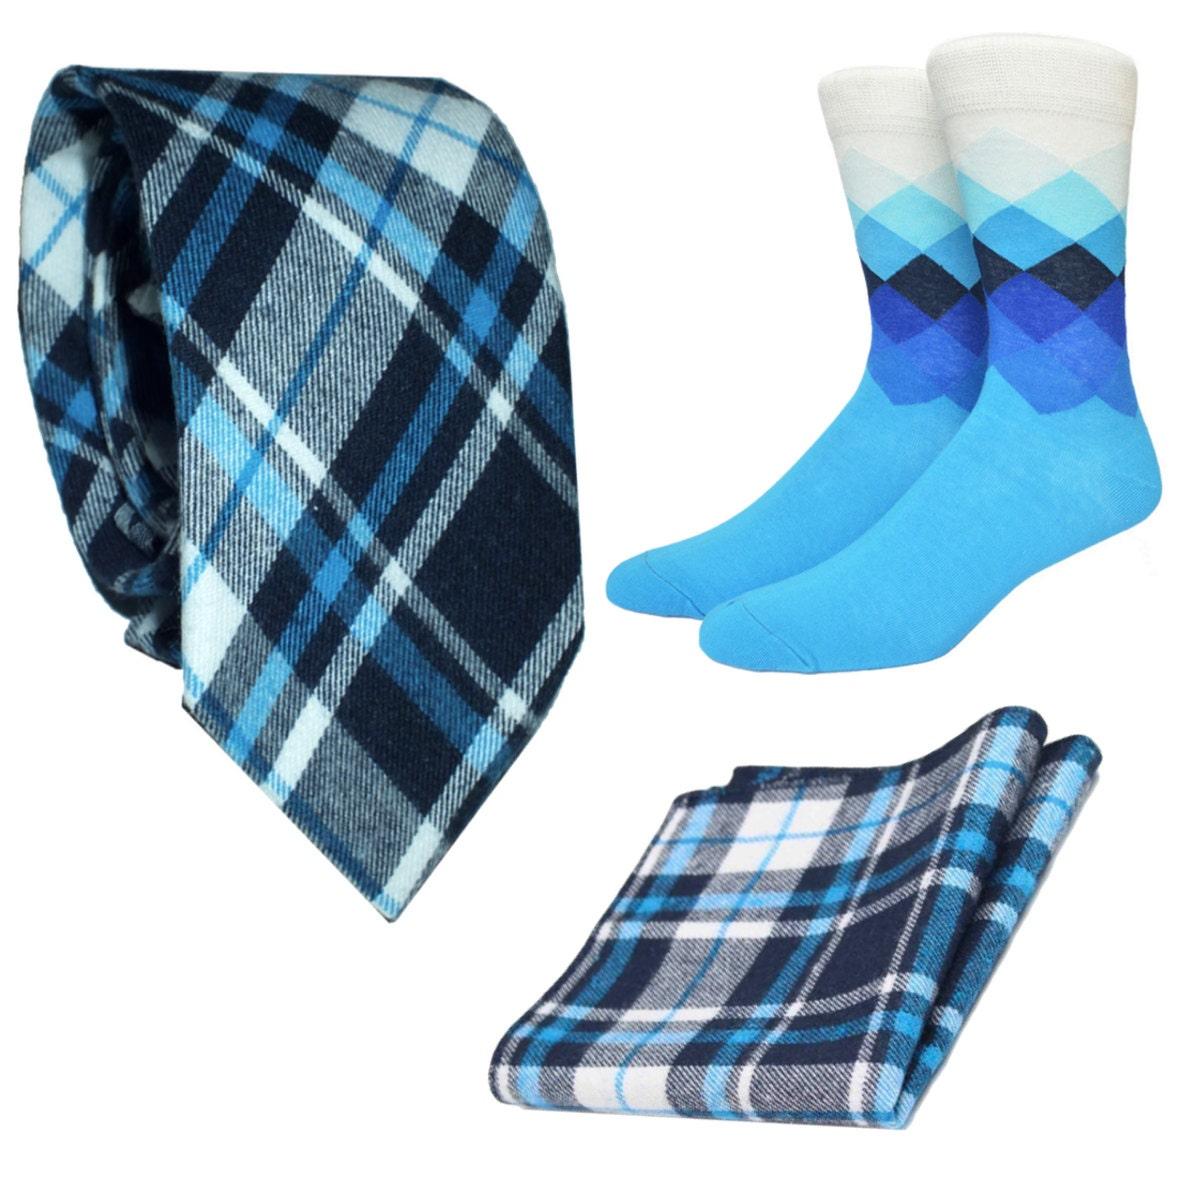 Matching Mens Socks NeckTie  Pocket Square blue navy black white check Plaid Bow Tie Set Gift Wedding Groom tartan argyle groomsman golf